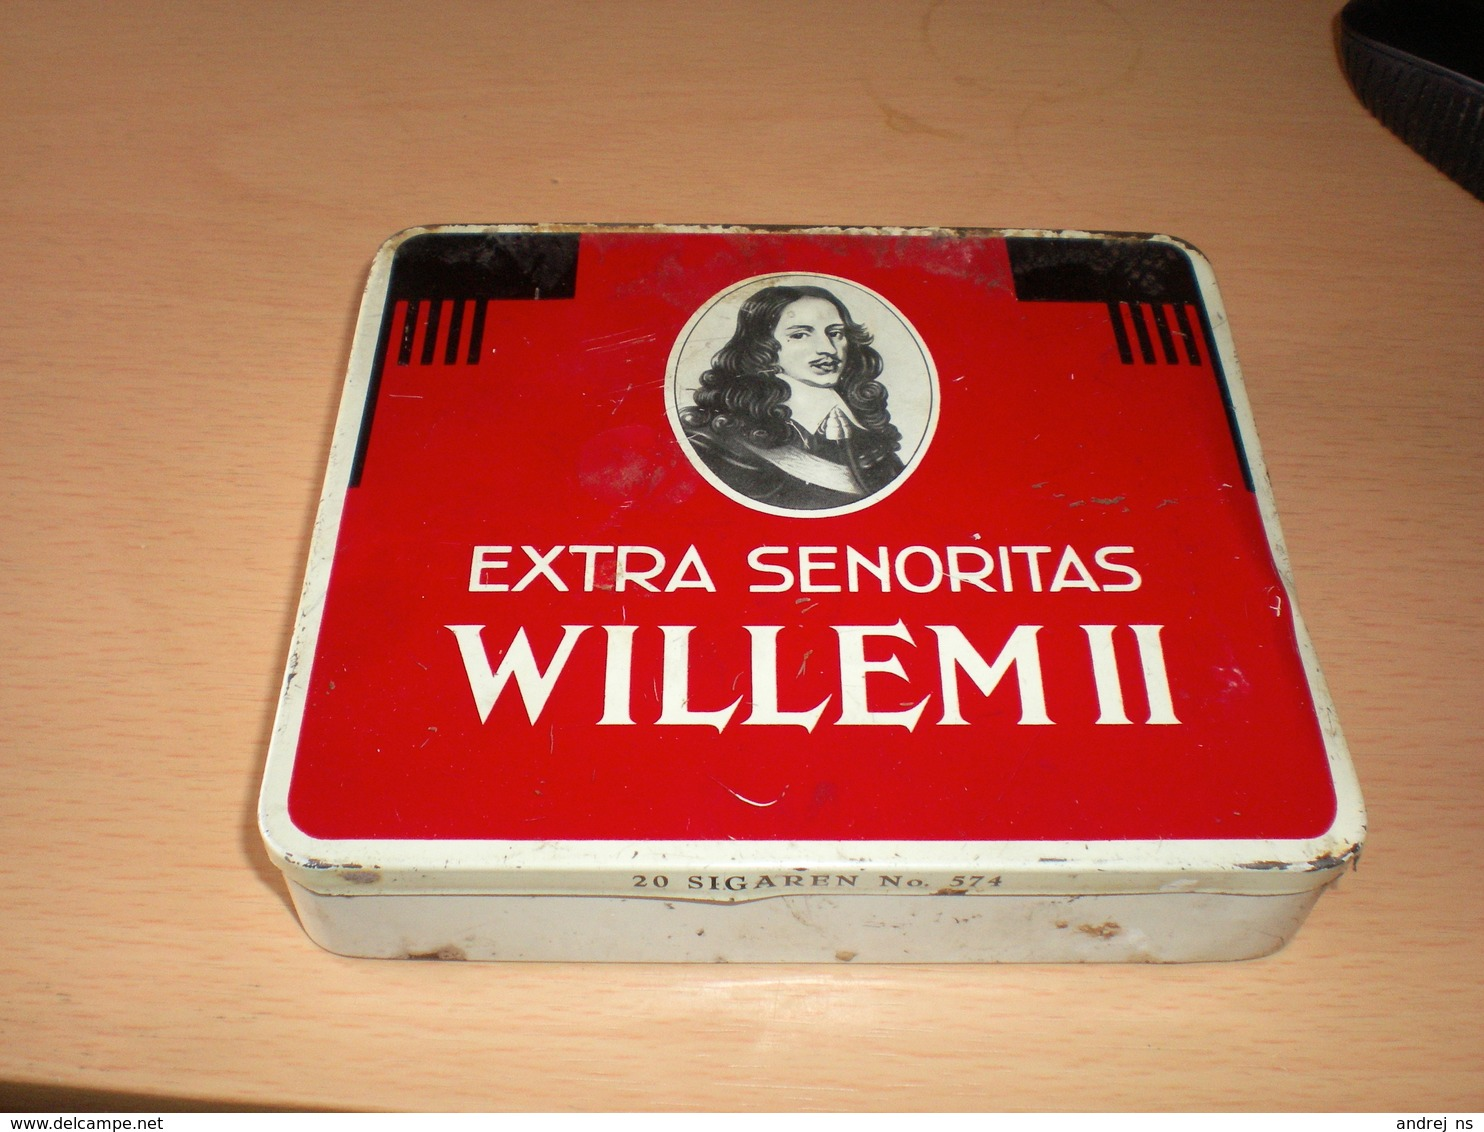 Extra Senoritas Willem II 20 Sigaren No 574  Valkenswaard Holland - Contenitori Di Tabacco (vuoti)